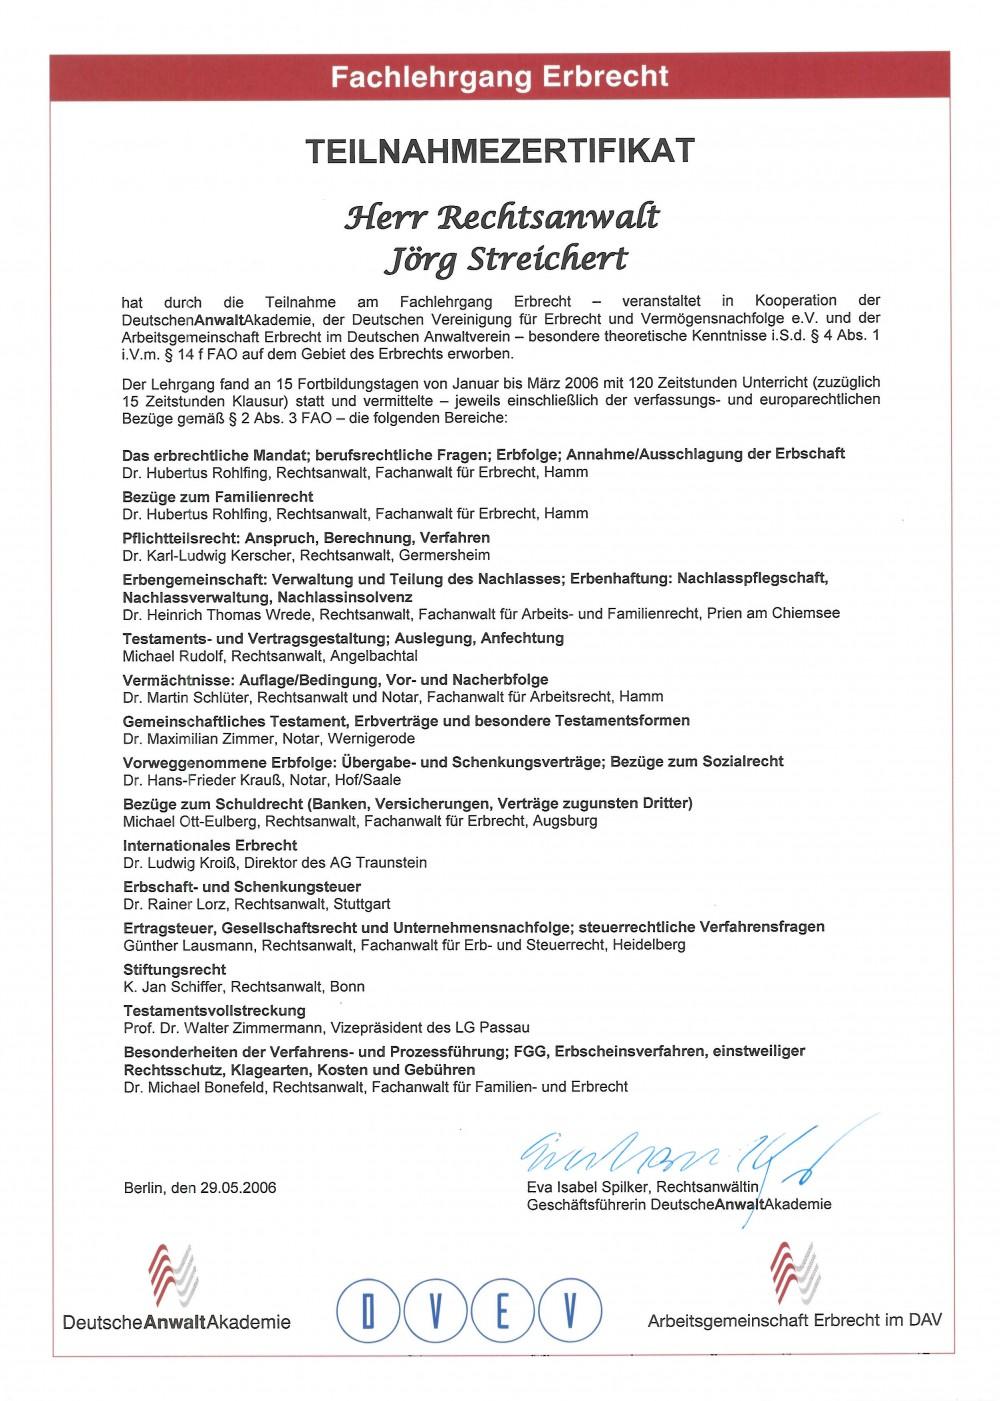 Teilnahmezertifikat Fachlehrgang Erbrecht(1)